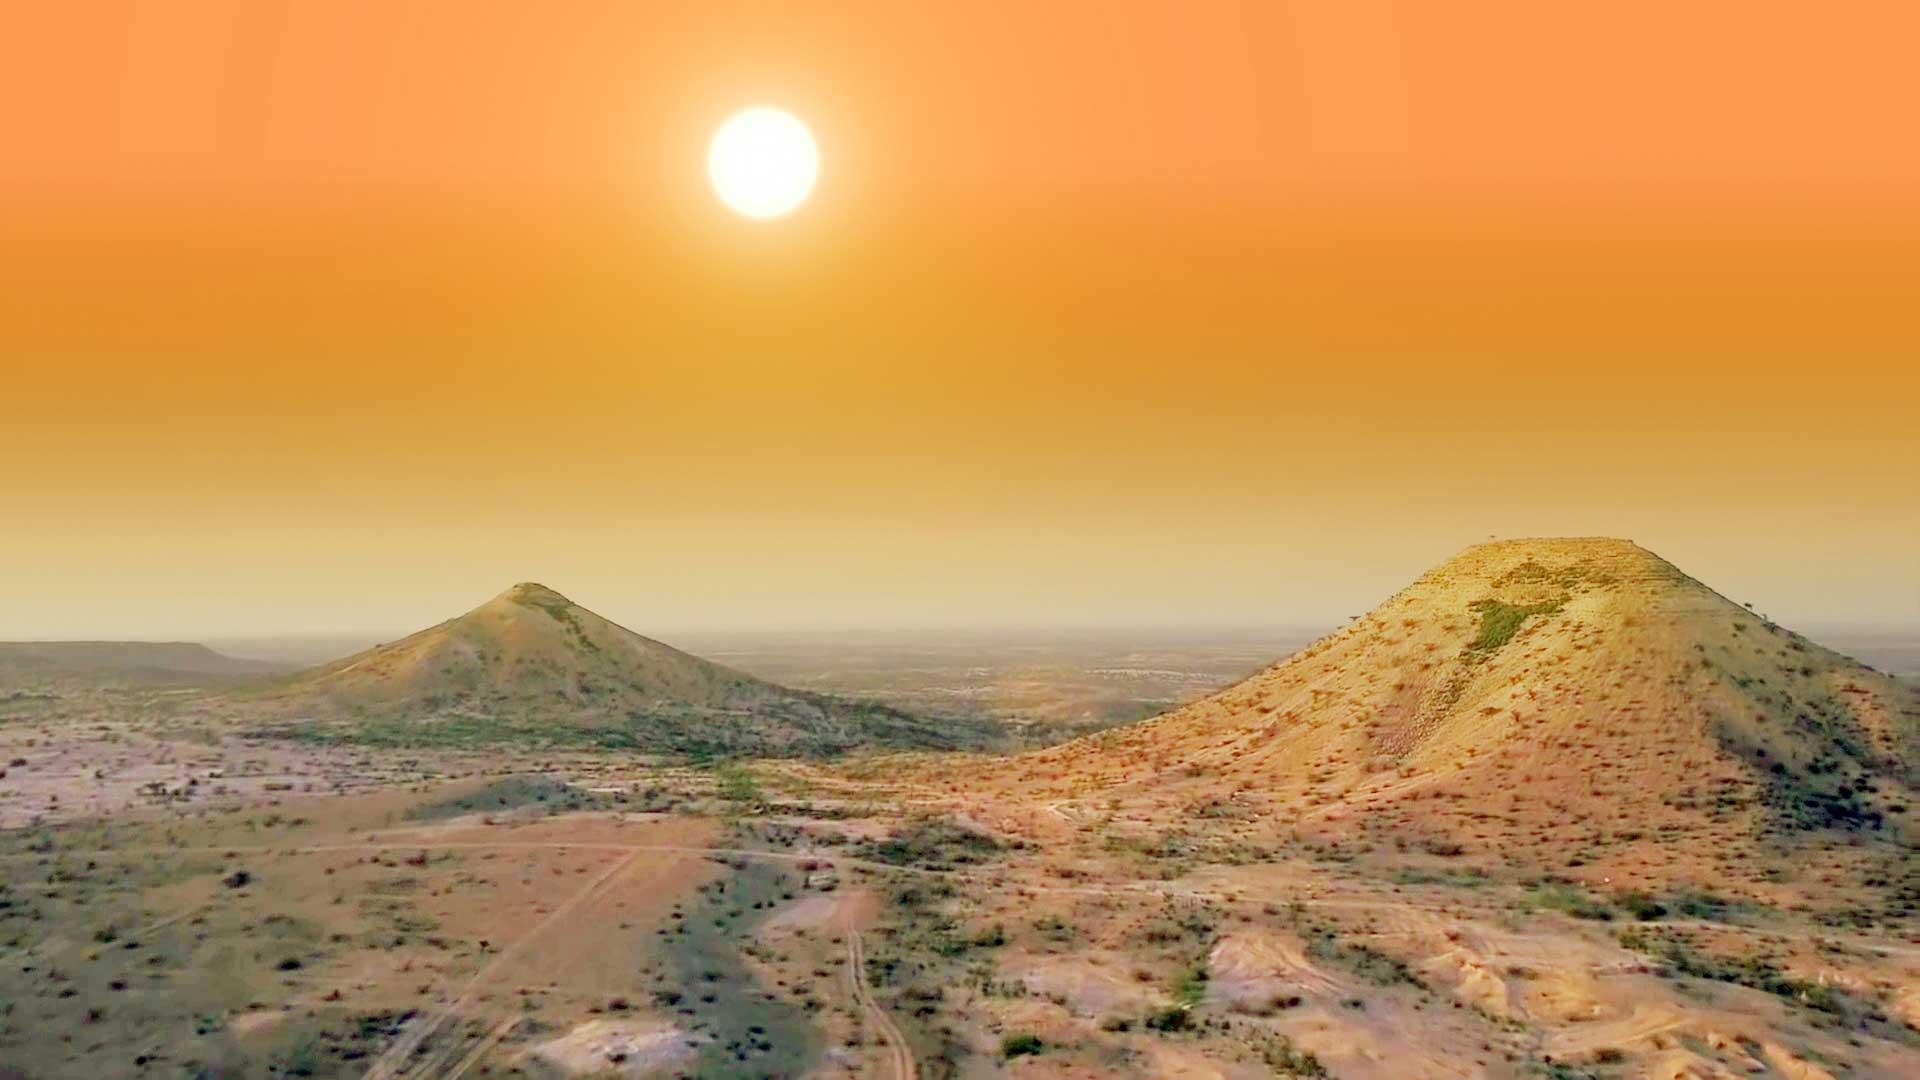 Naasa Hablood Hargeisa Somaliland Virgin S Breast